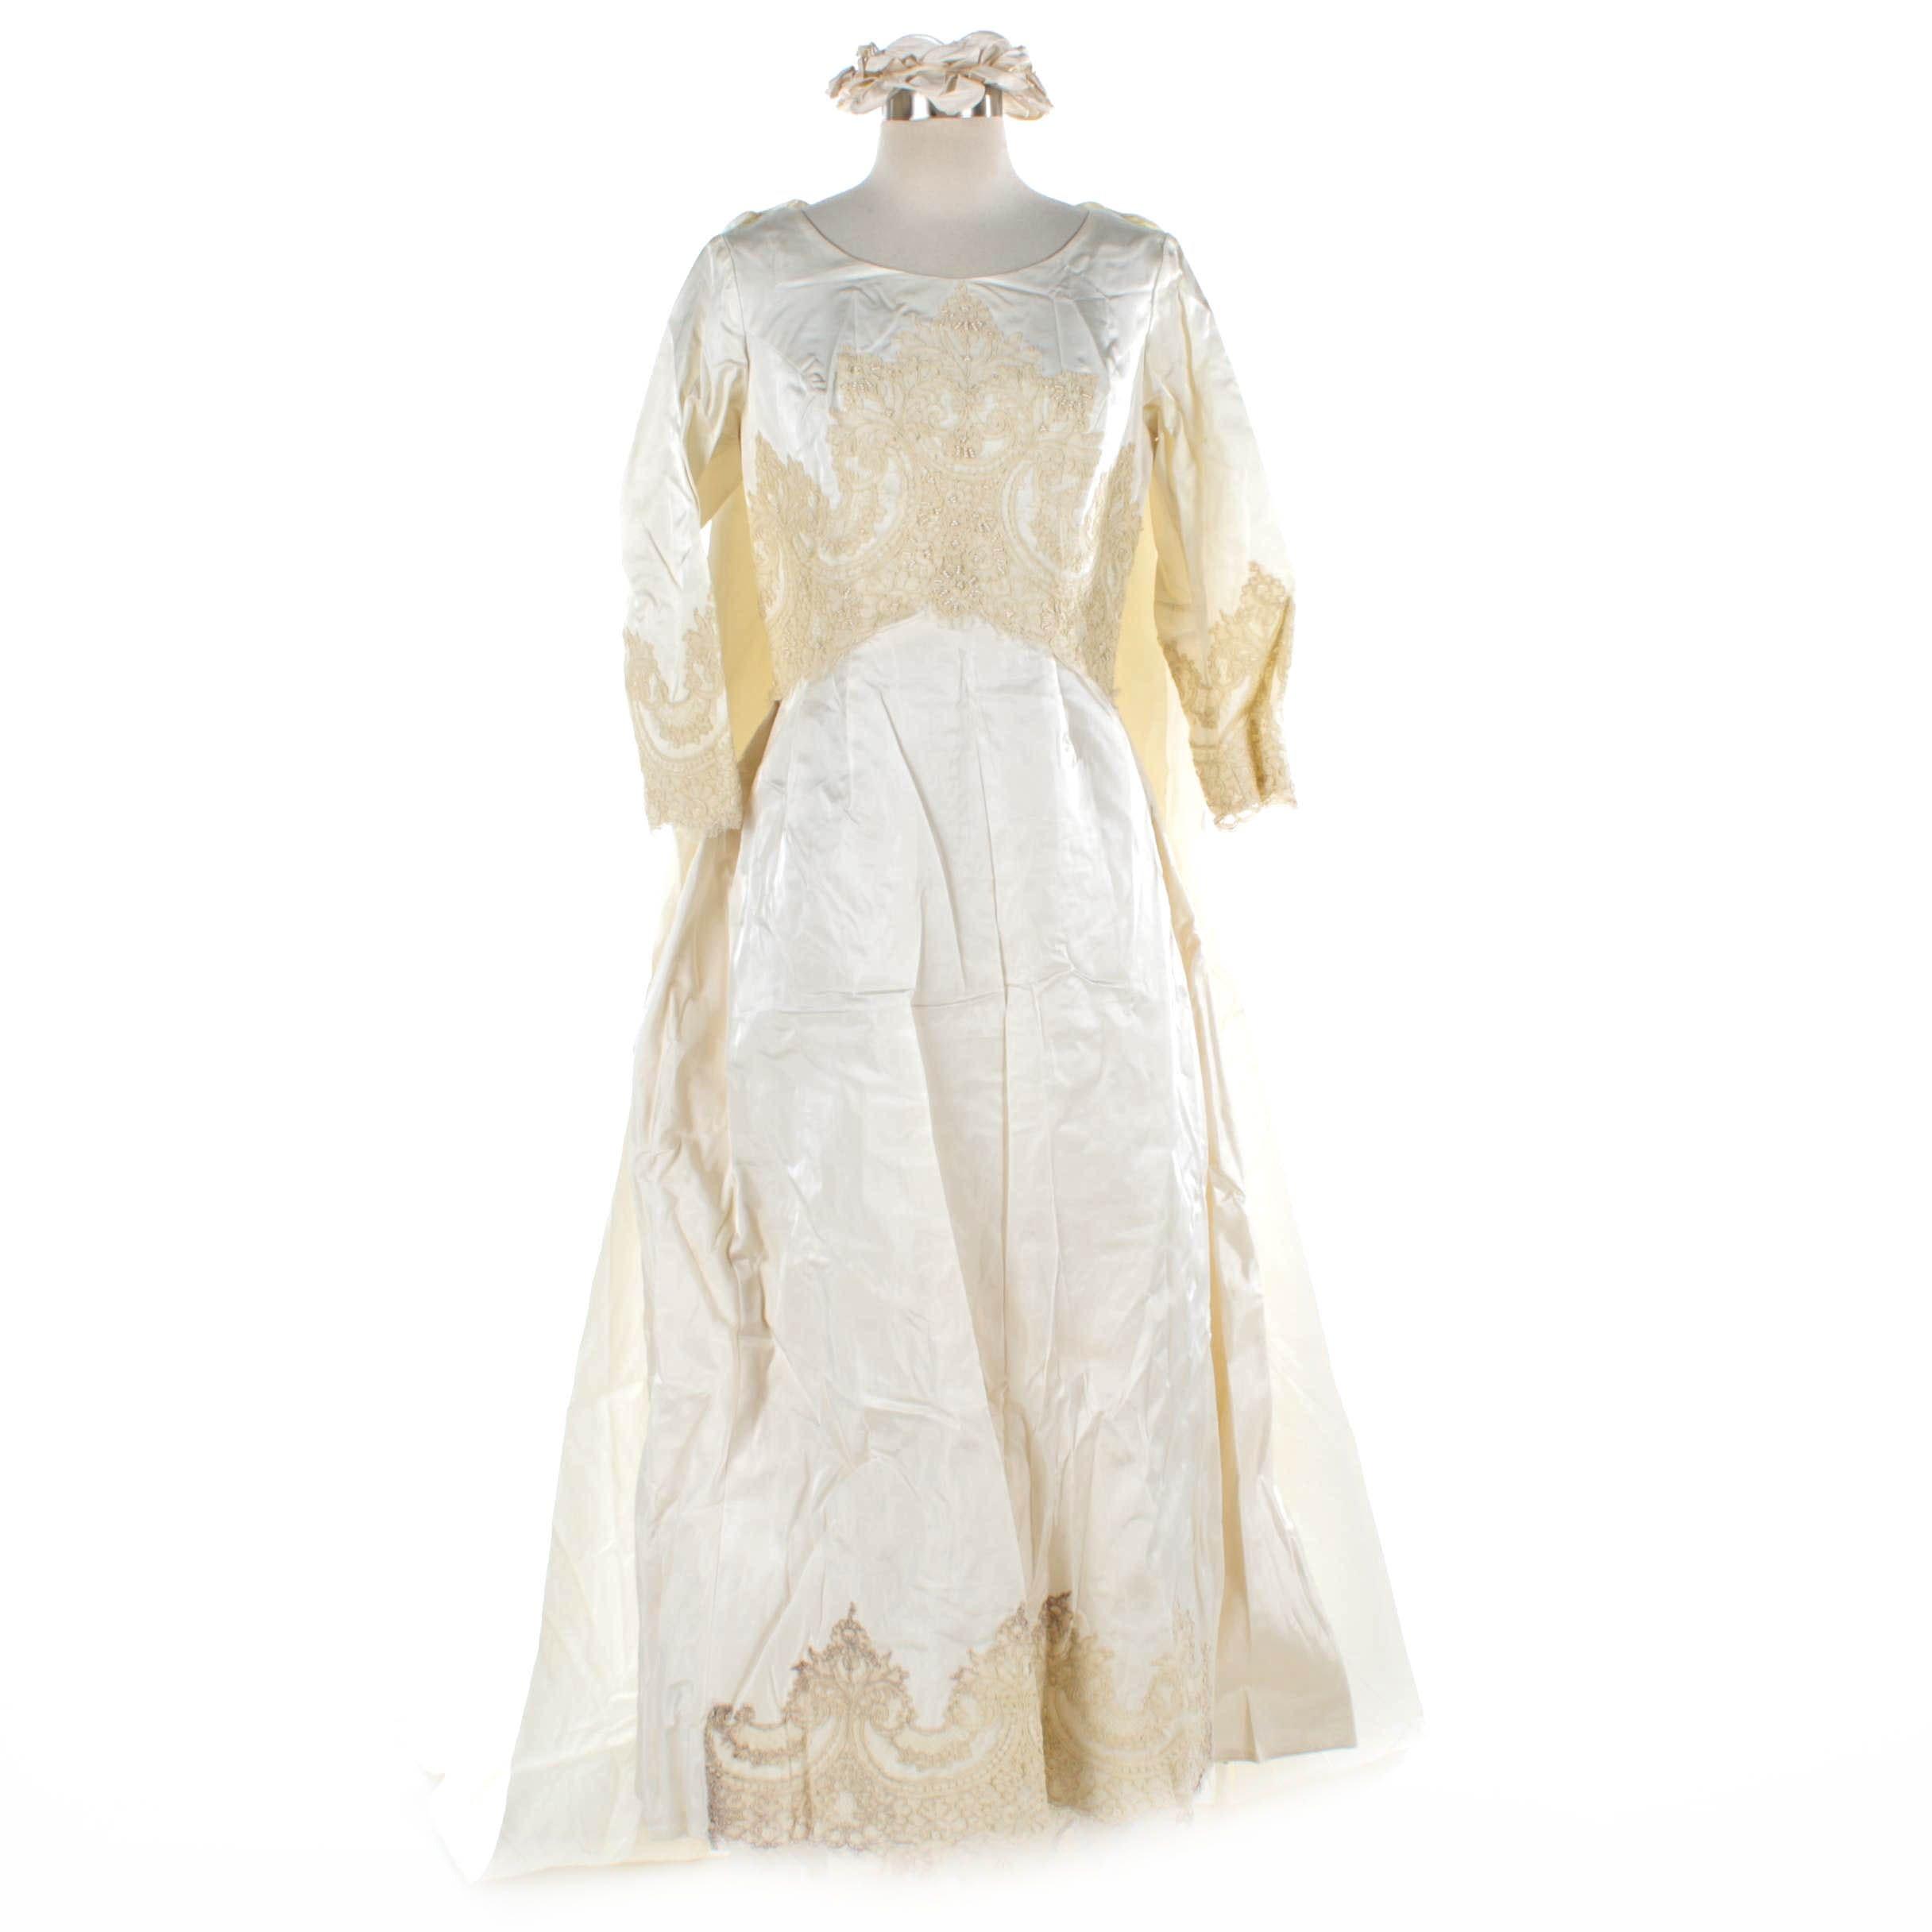 Circa 1960s Vintage Wedding Dress, Detachable Train and Headpiece